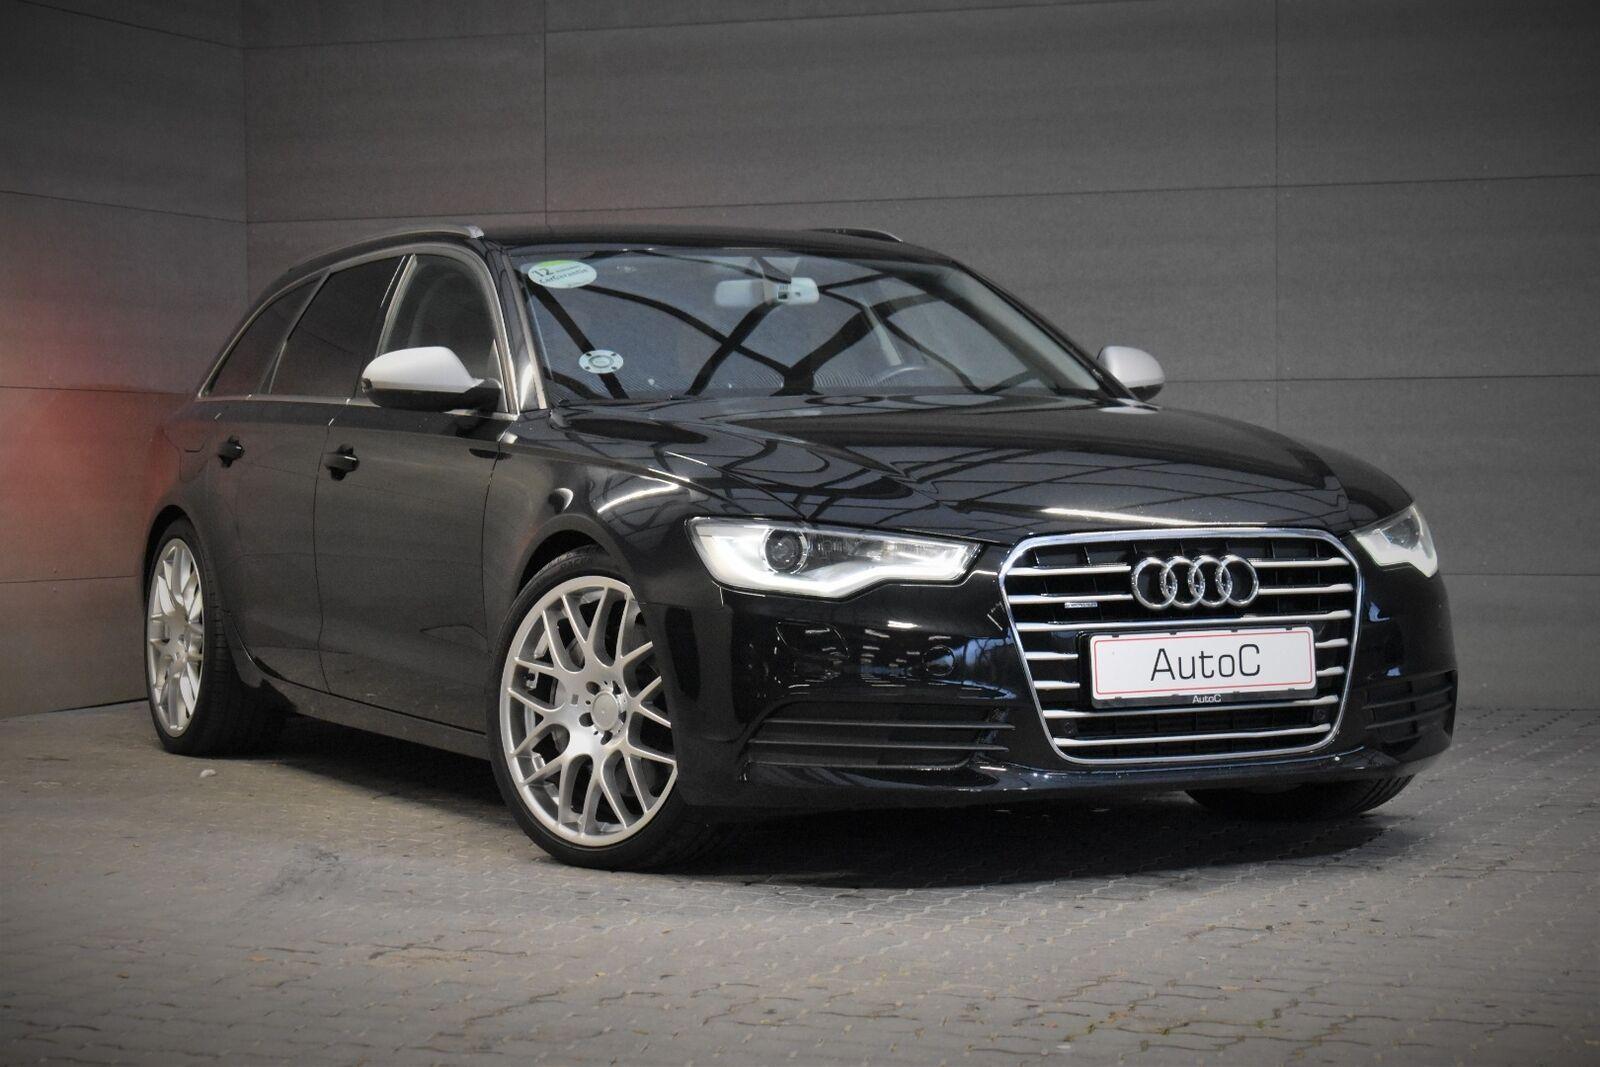 Audi A6 3,0 TDi 313 Avant quattro Tiptr. 5d - 299.800 kr.